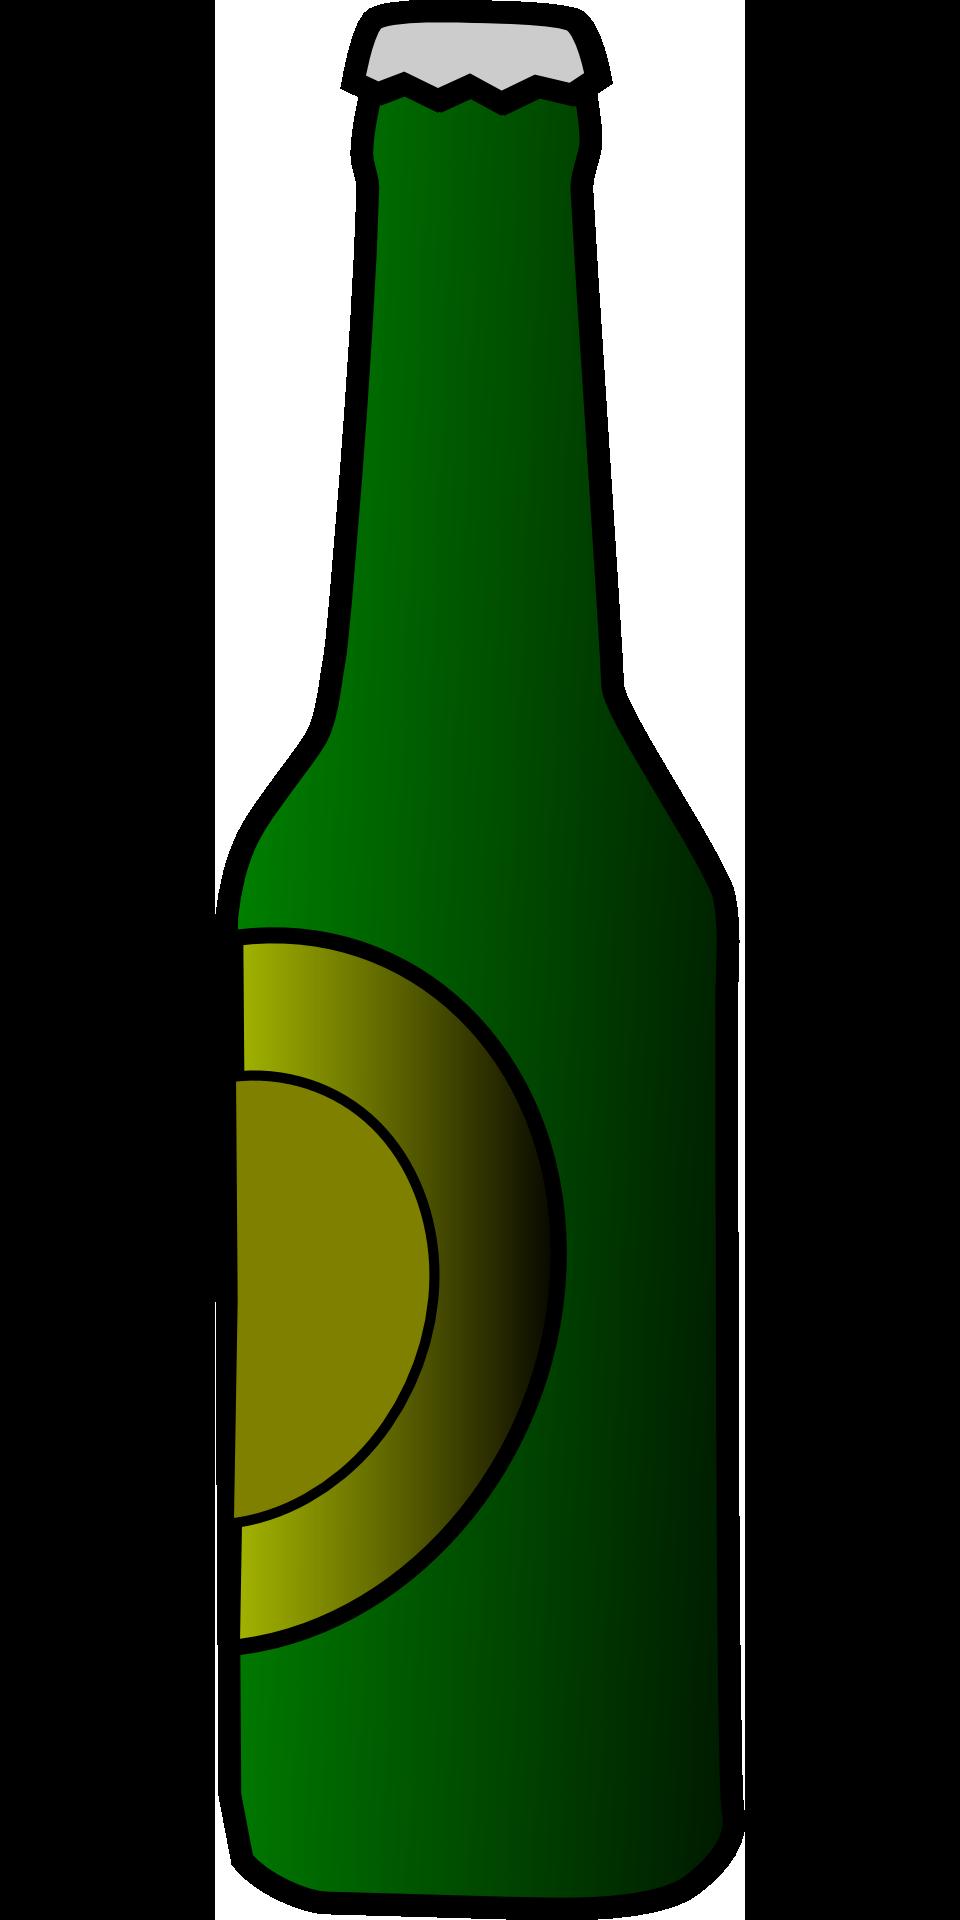 Drinking clipart bottleclip. Botella de cerveza clip